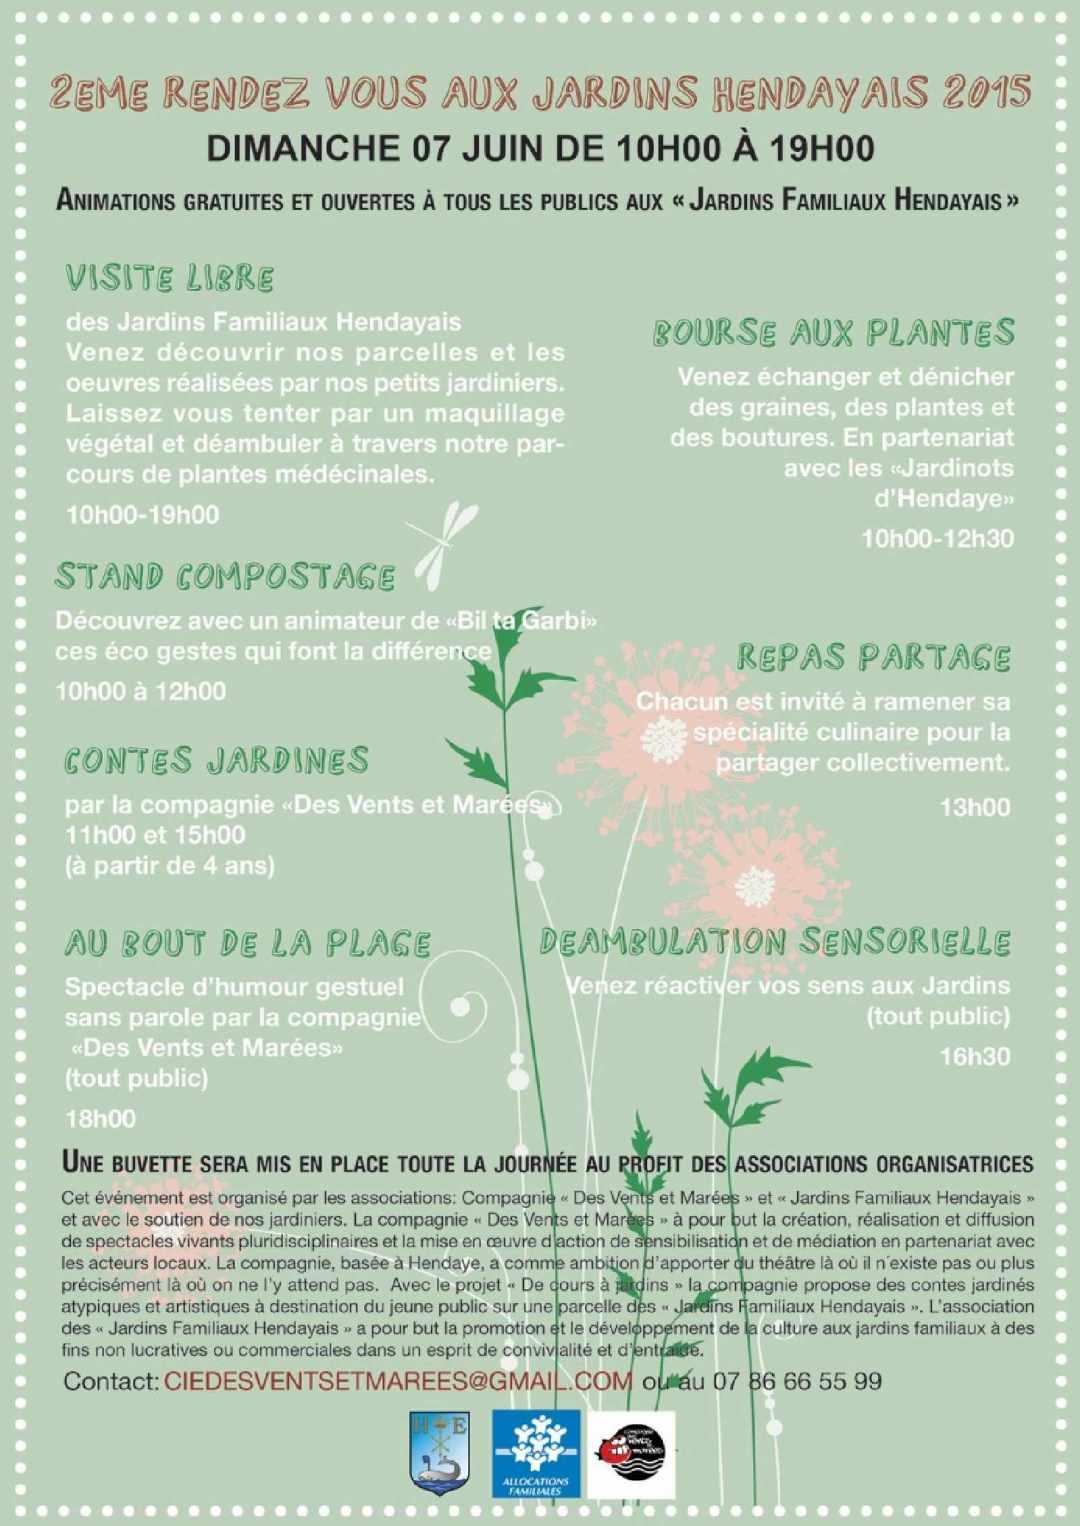 Programme Jardins Familiaux Hendayais 2015+